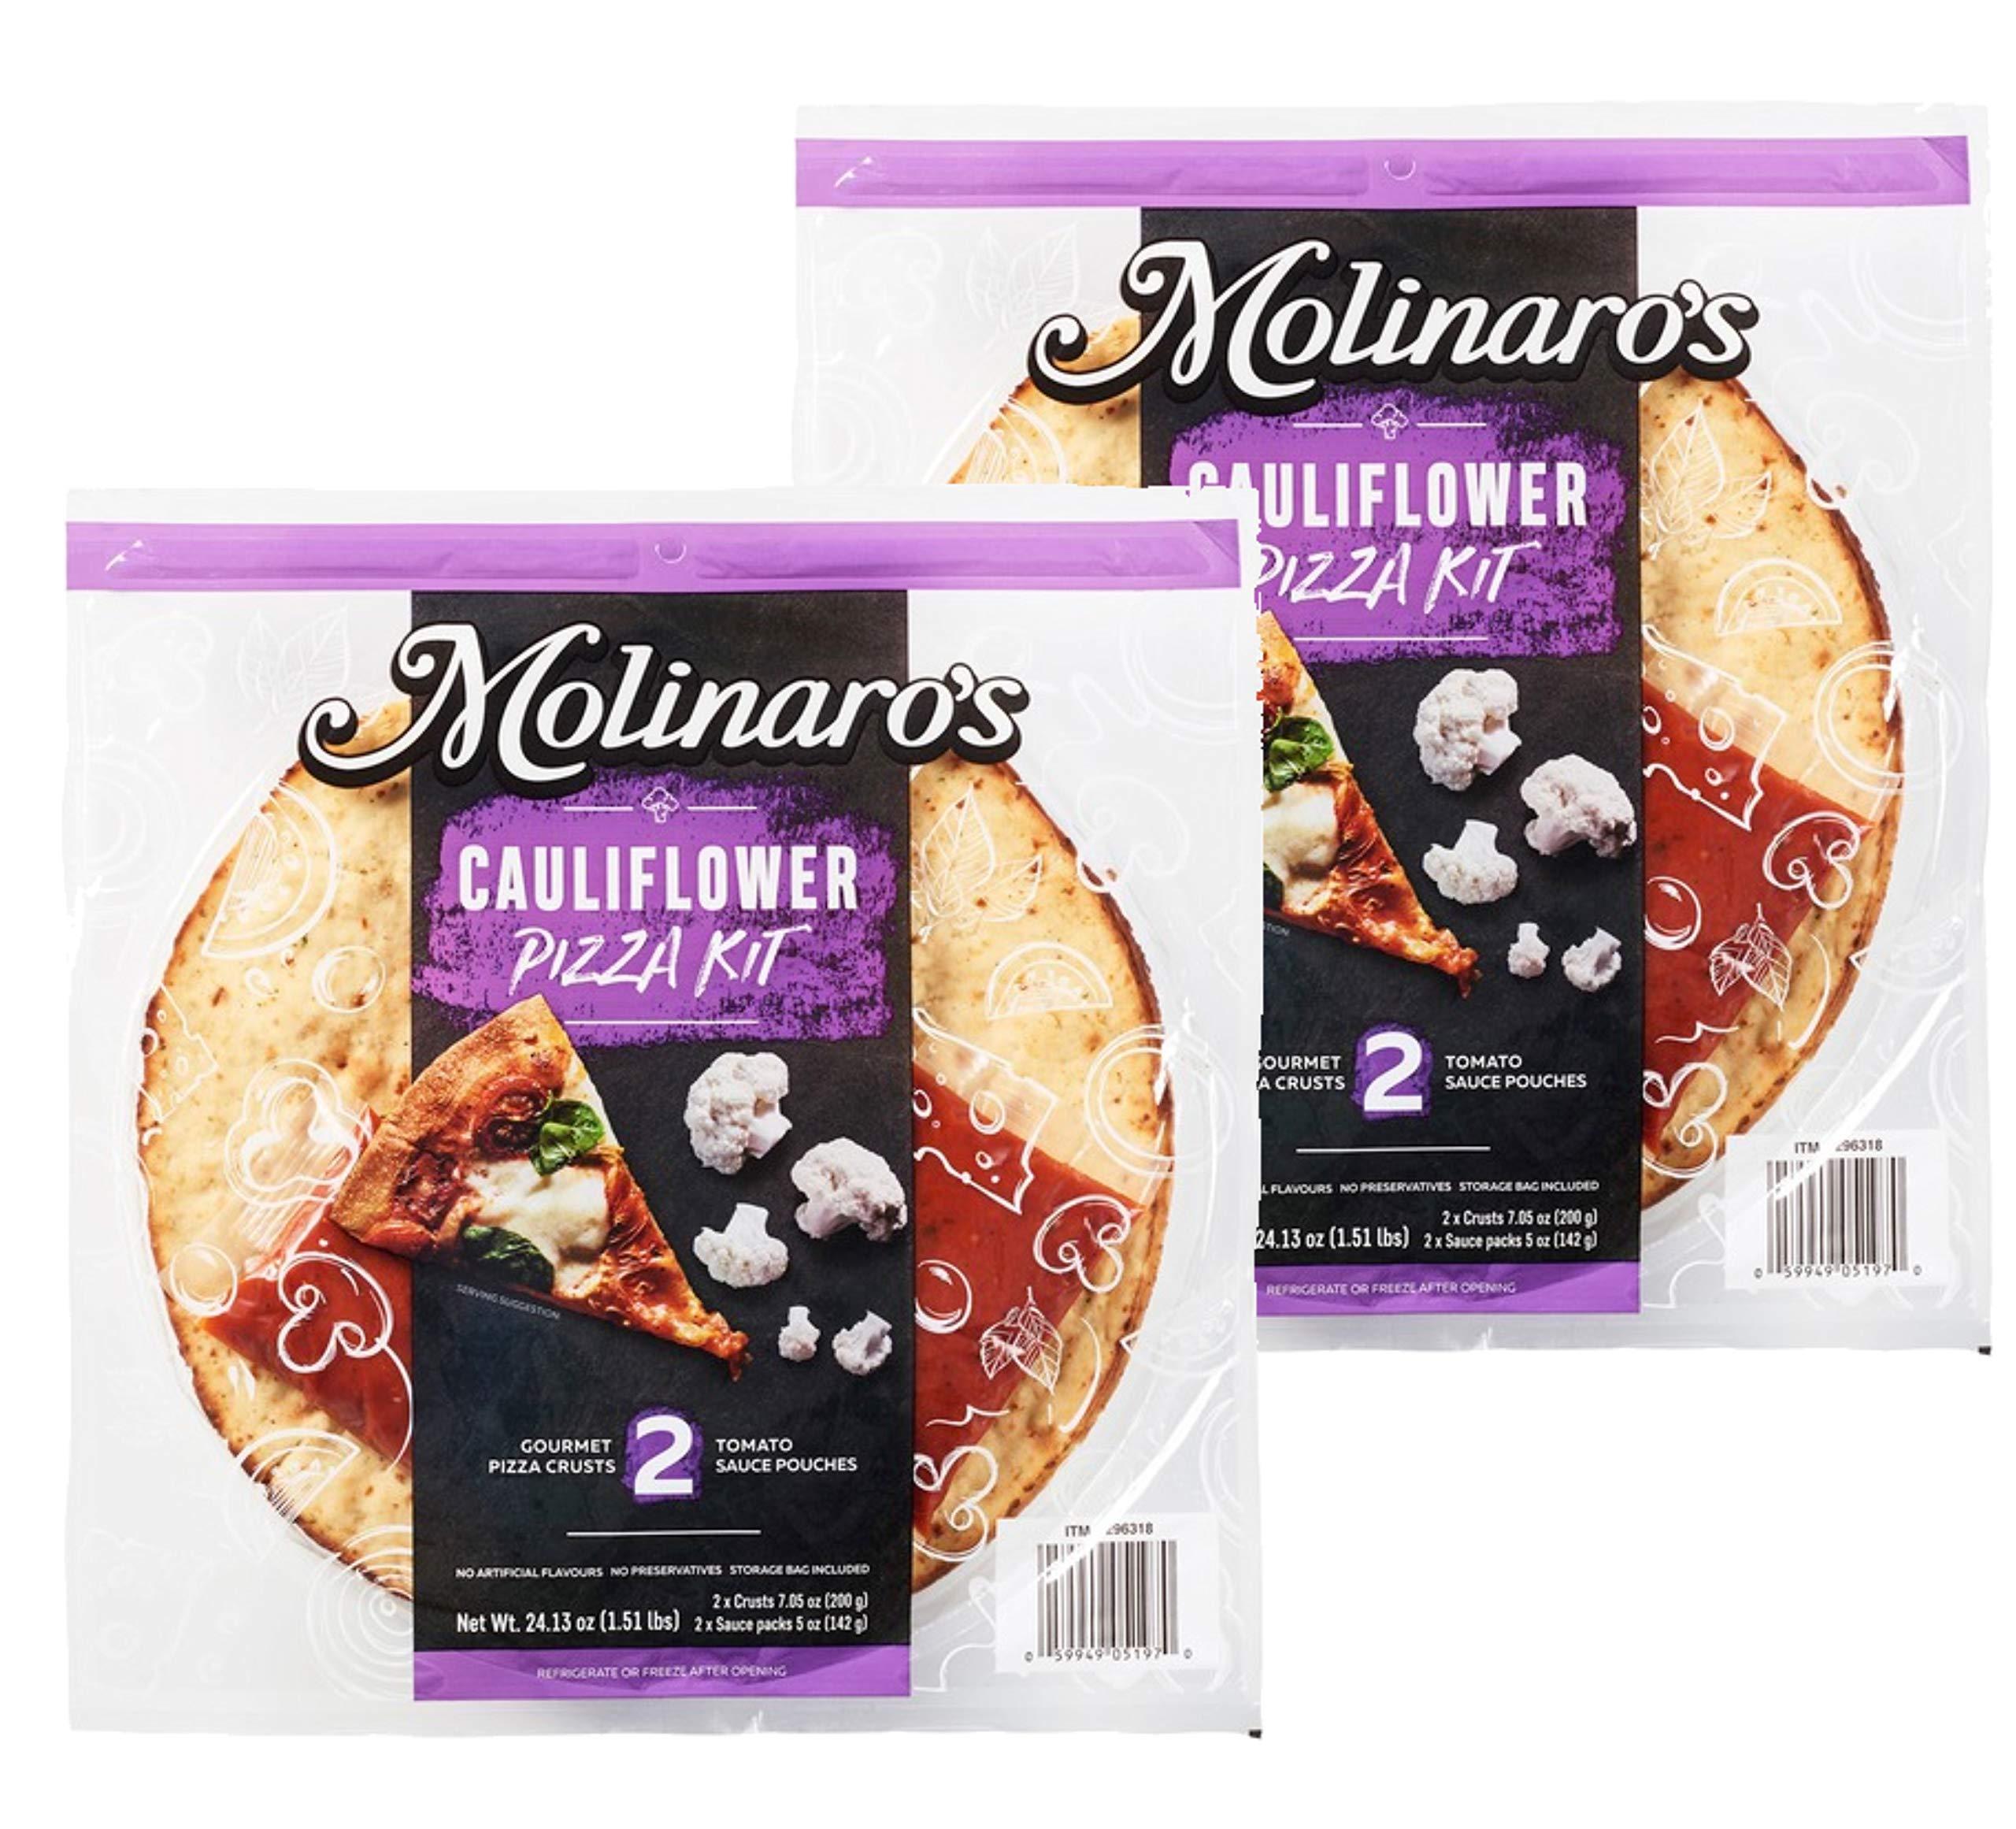 Molinaro's Cauliflower Pizza Kit Gourmet Pizza Crust & Tomato Sauce: 2 Pack (4 ct.) by FCV